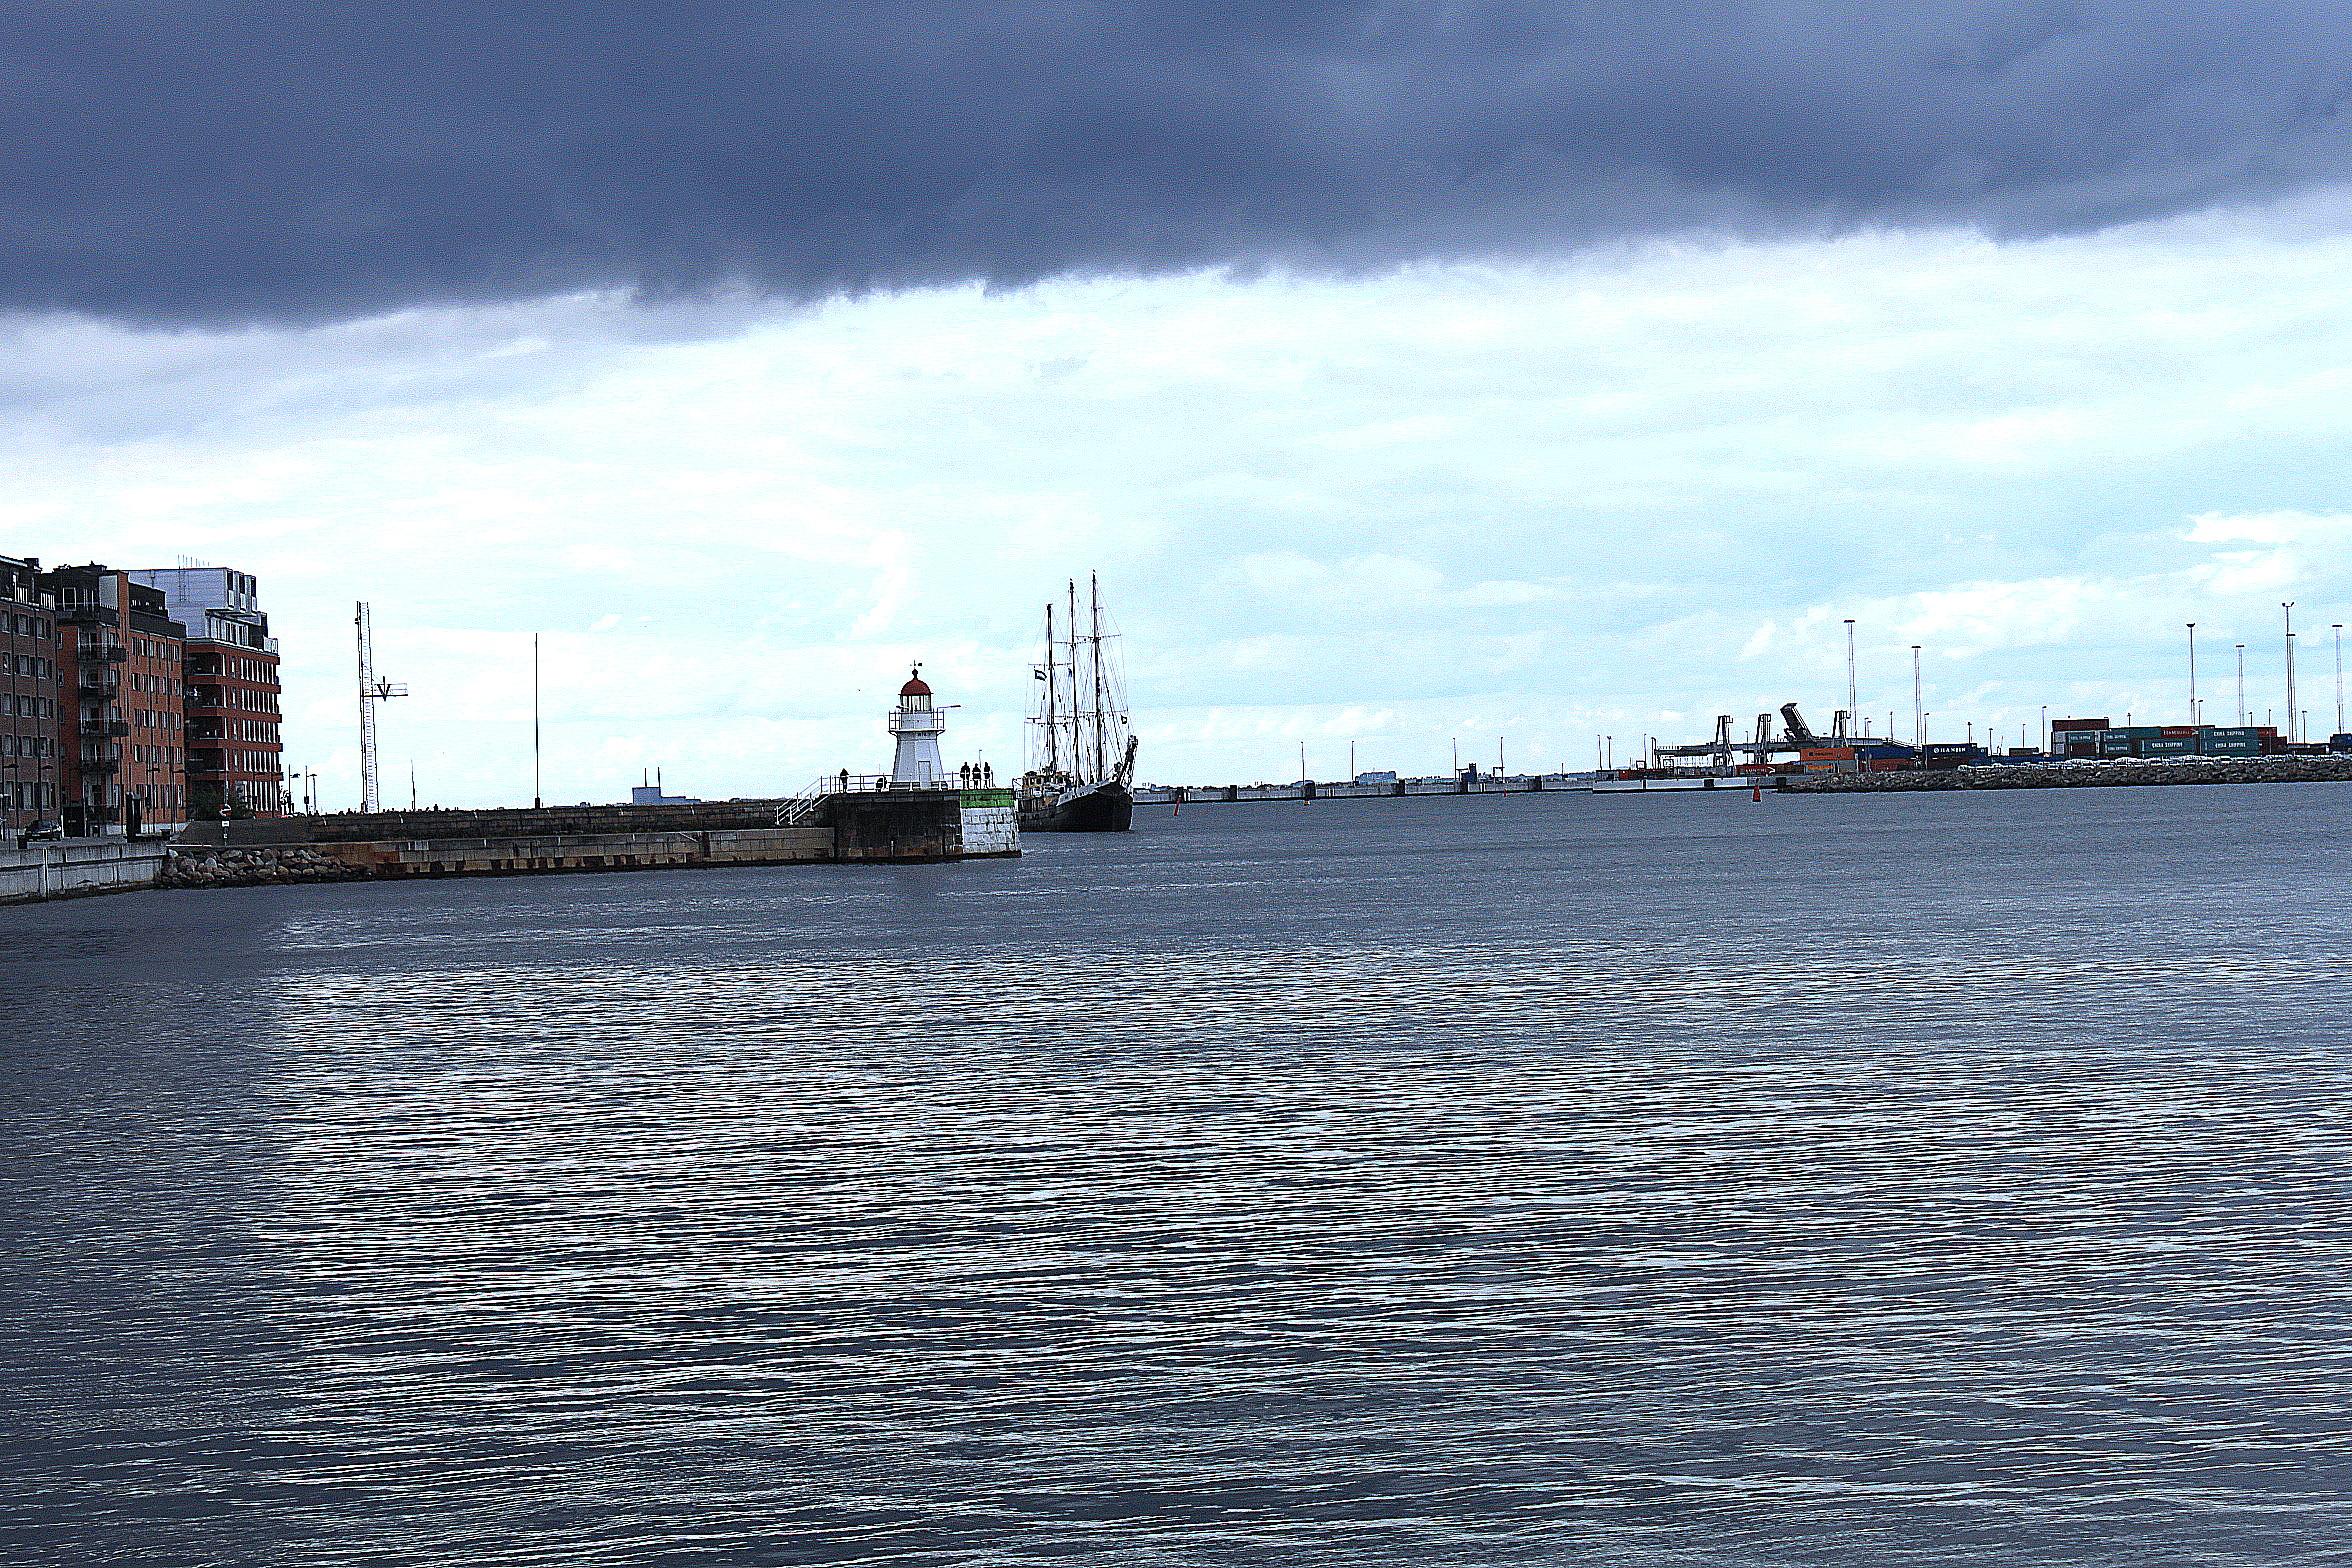 Mikael wiehe seglar med ship to gaza